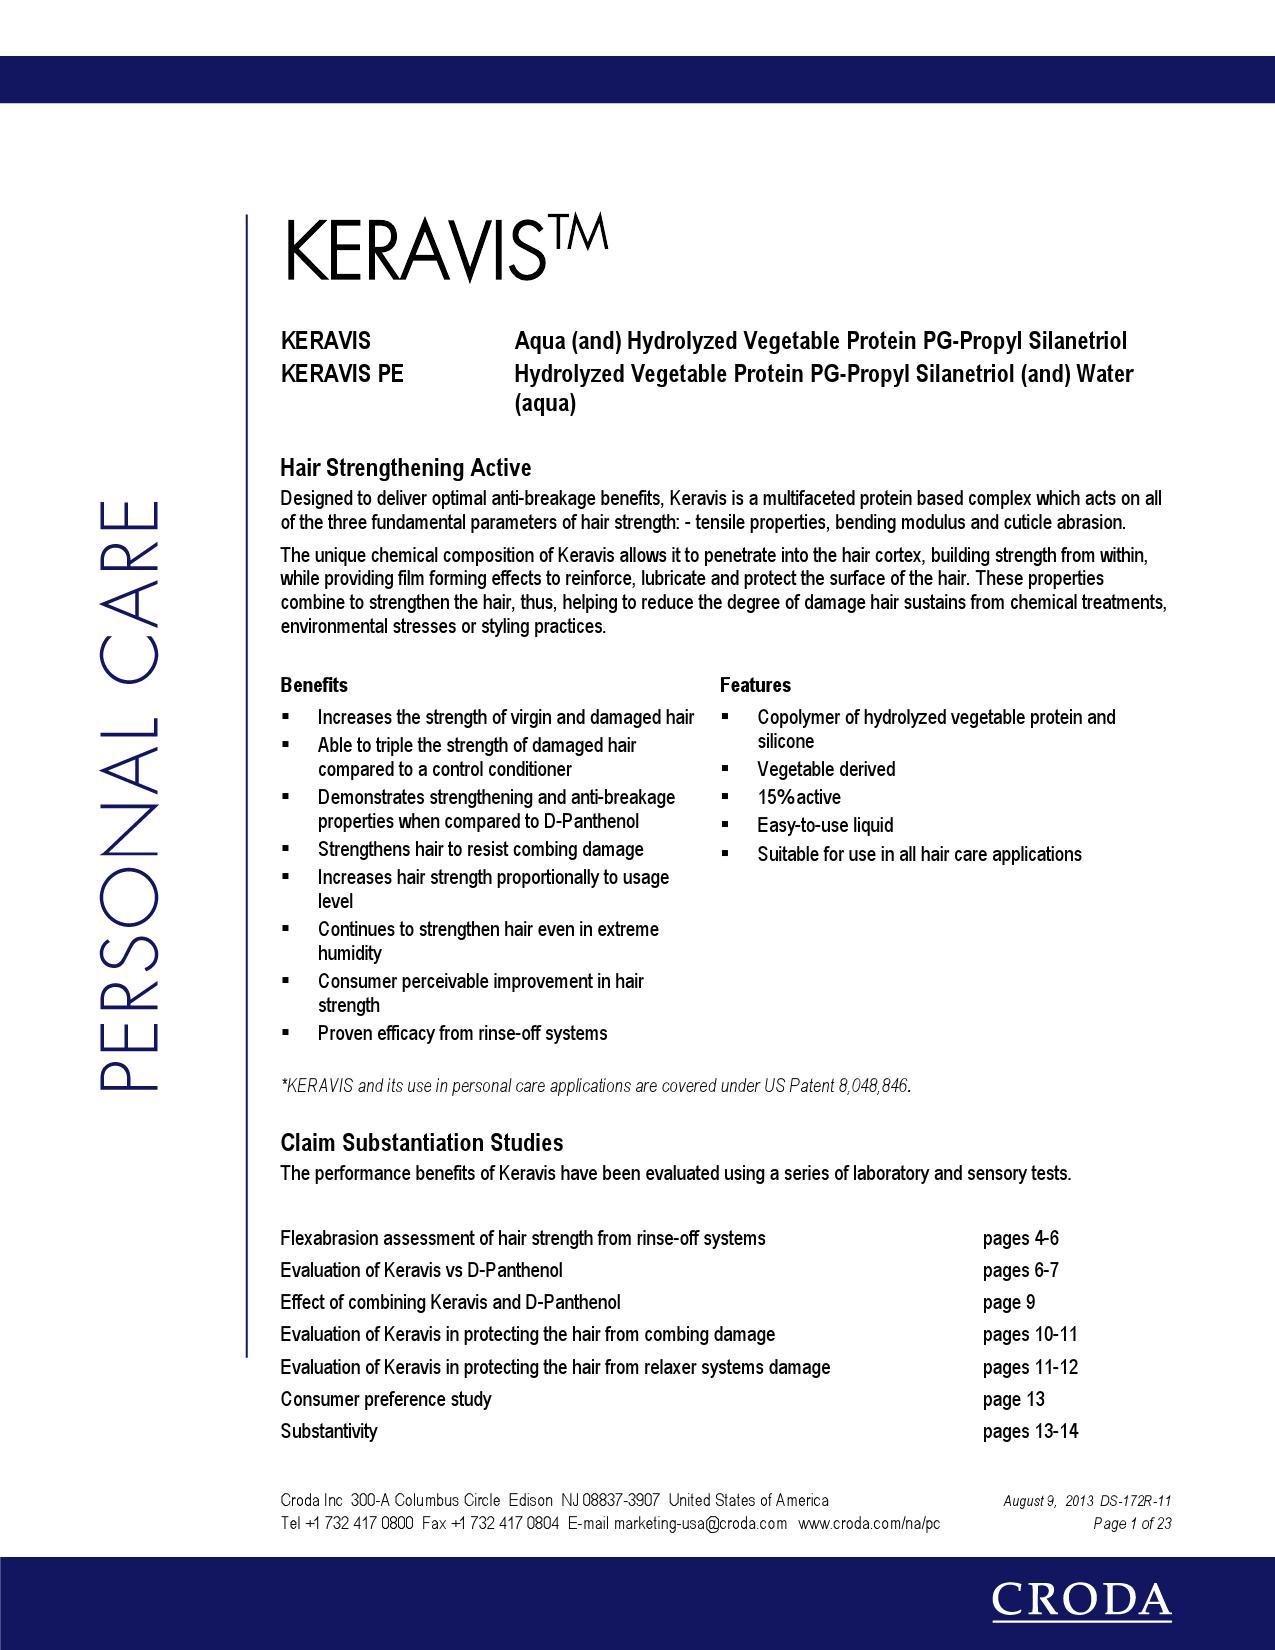 keravis-croda-data-sheet-000001.jpg